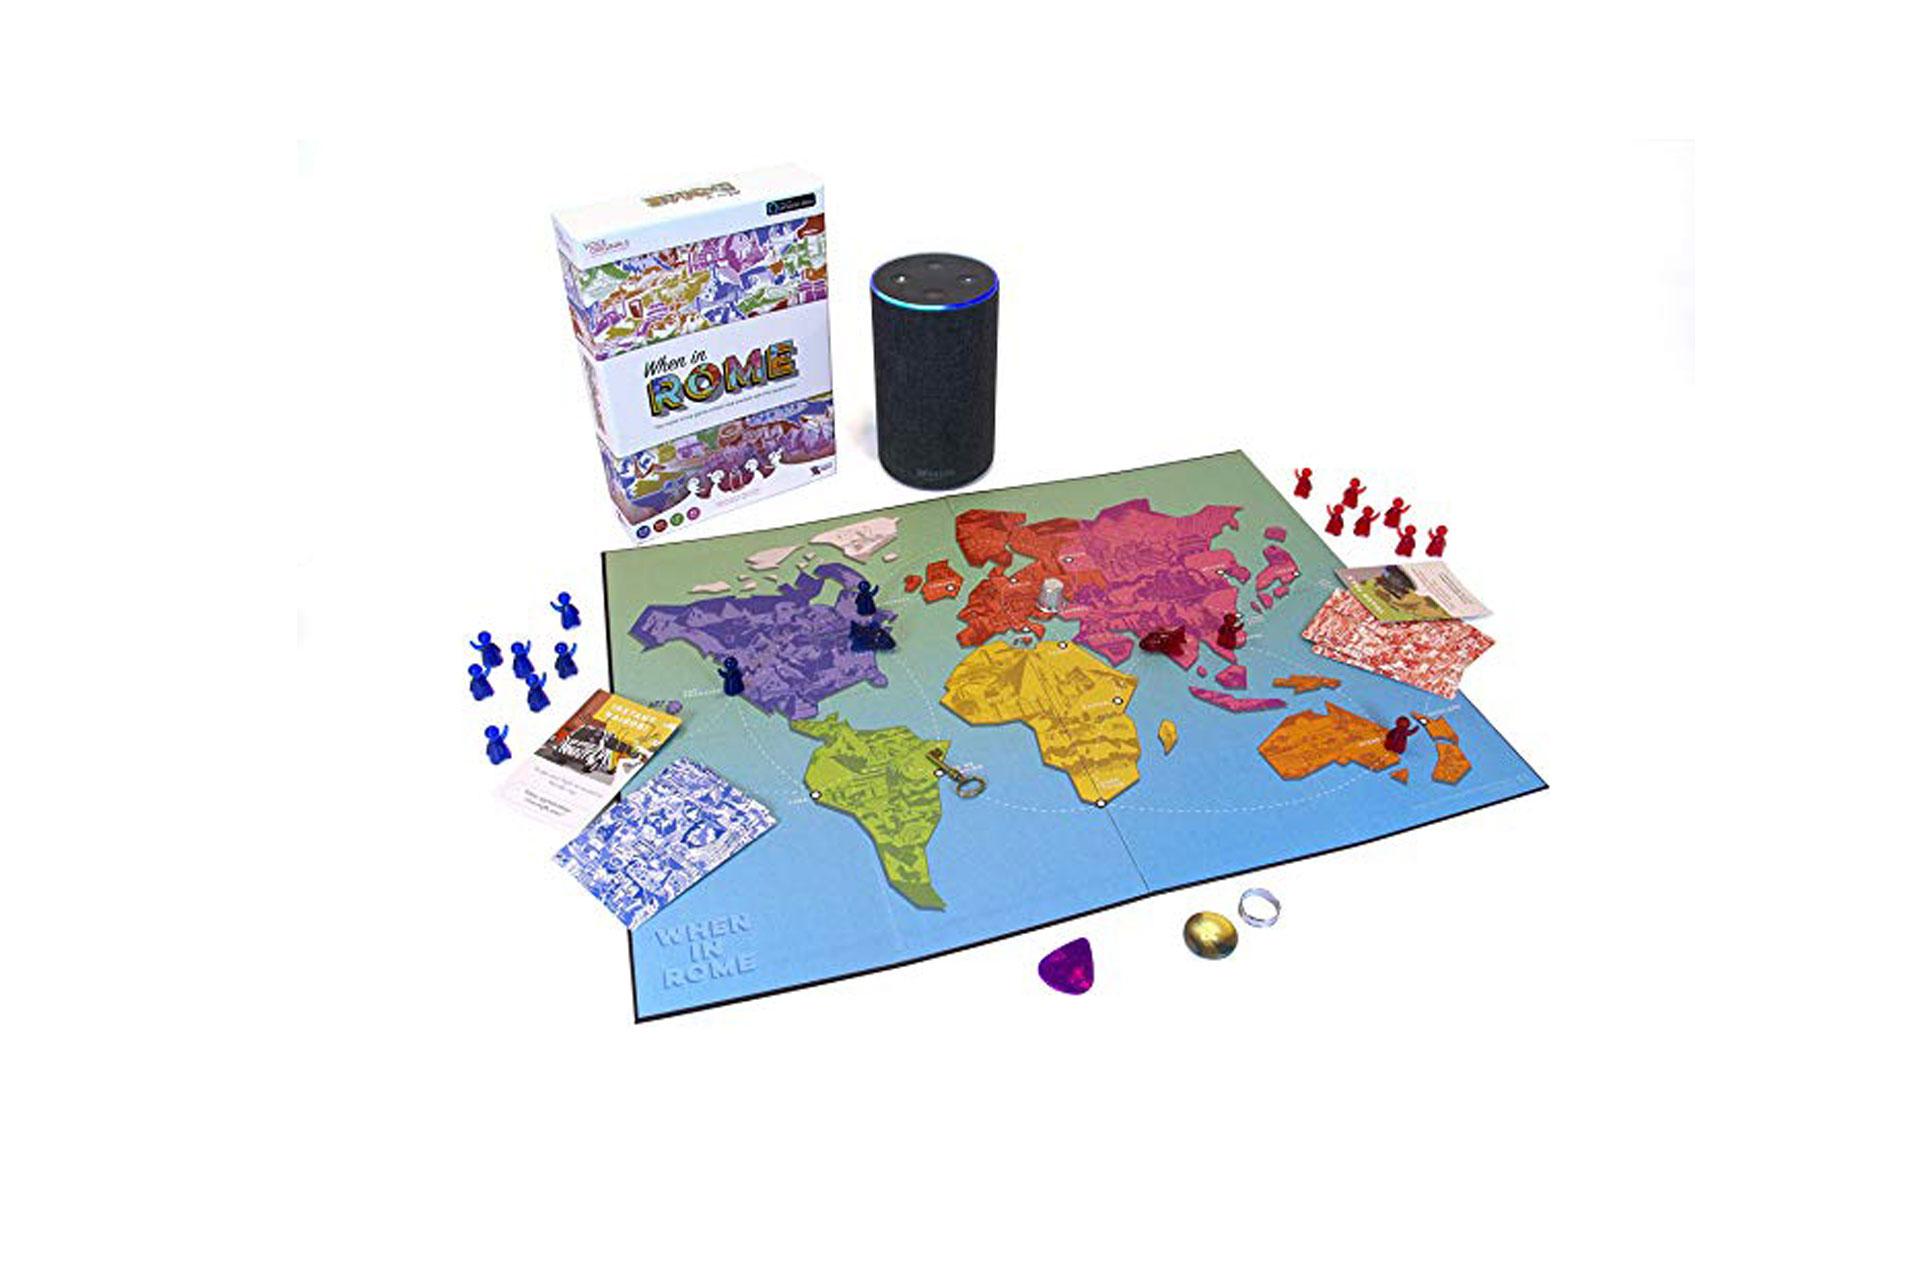 When In Rome Alexa Game; Courtesy of Amazon